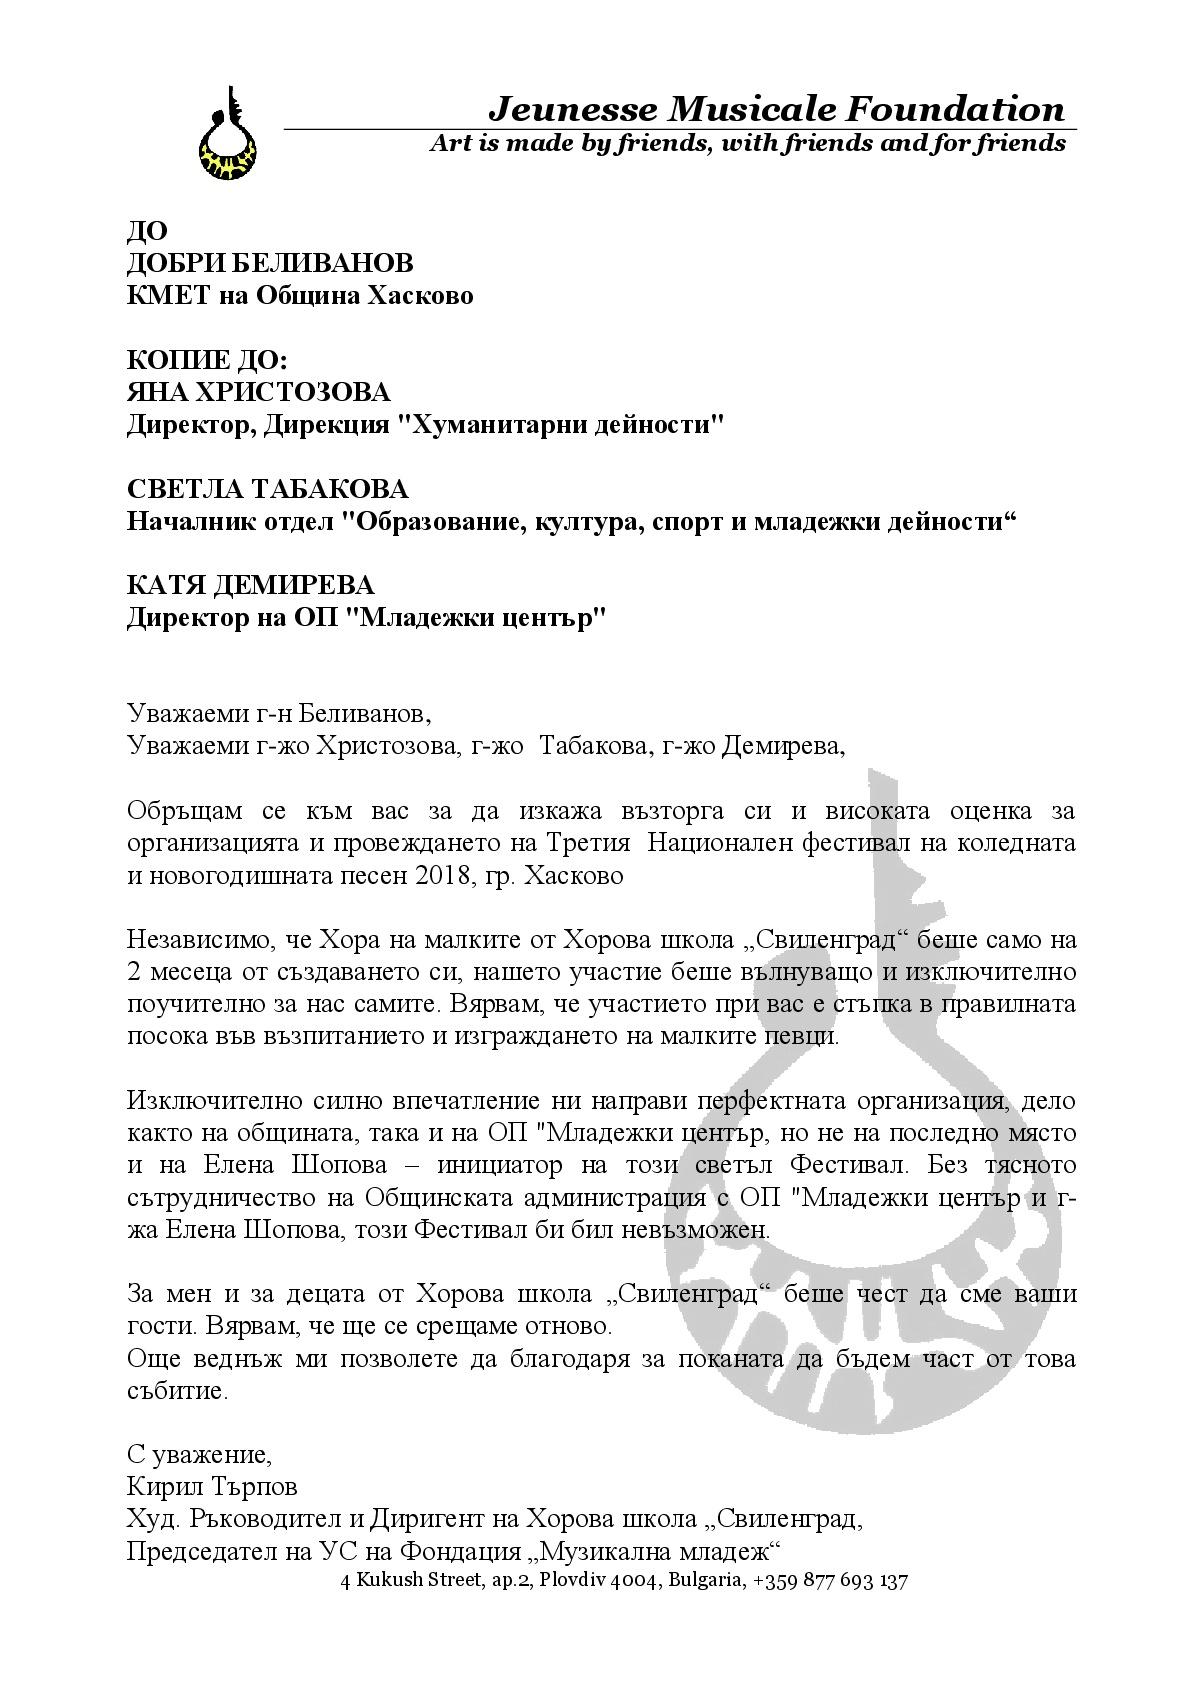 svilengrad_letter_Хасково-001